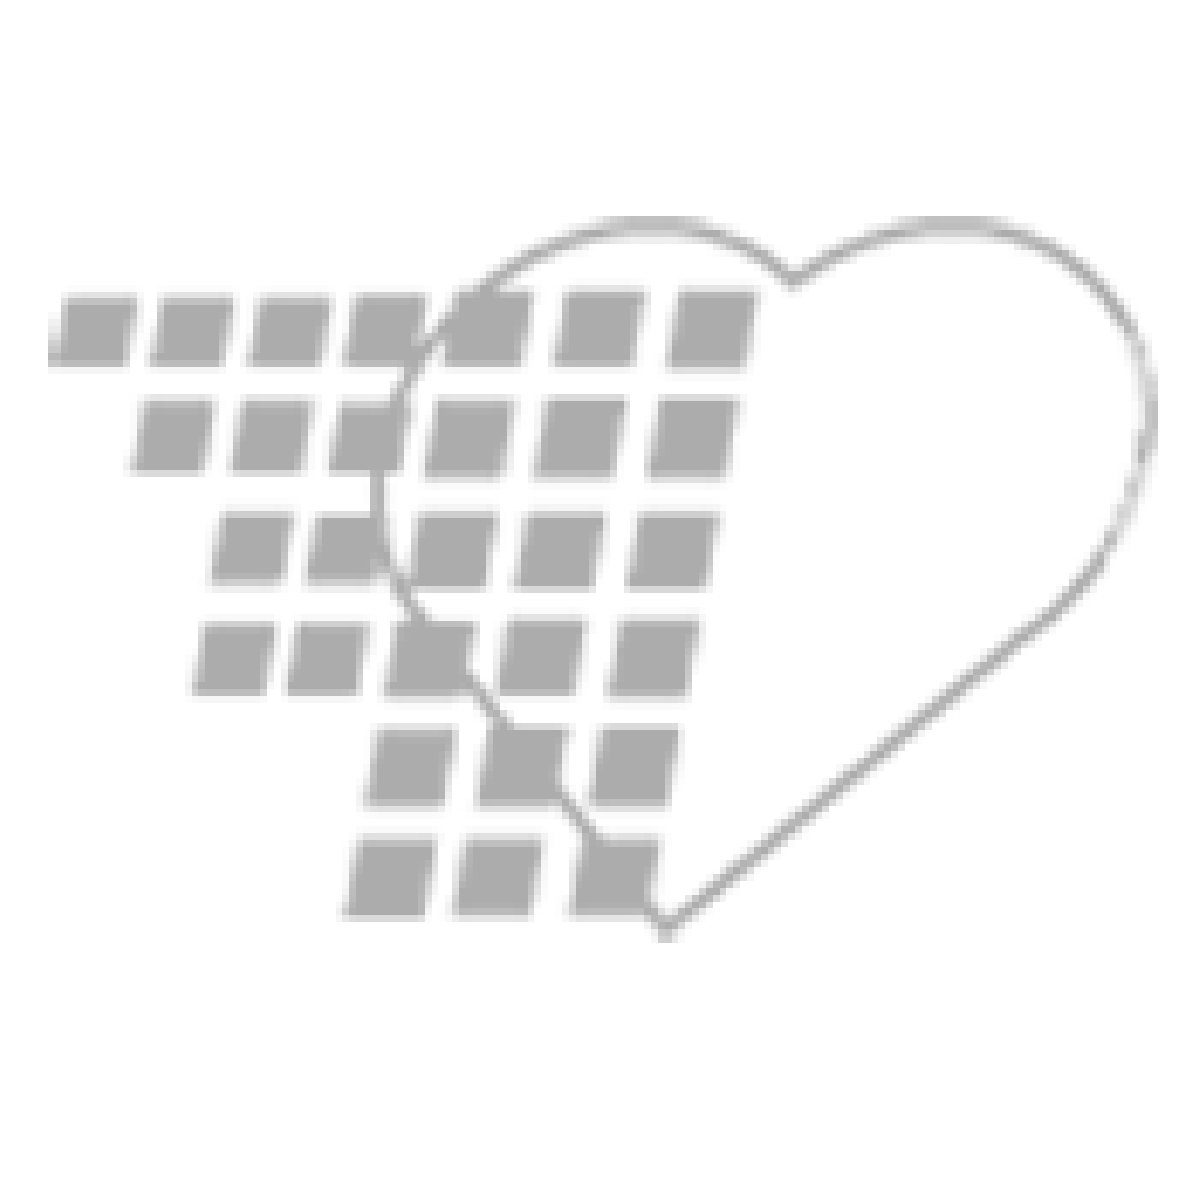 06-93-9008 - Demo Dose® Garamycn (Gentamicn) 2mL 80mg/2mL